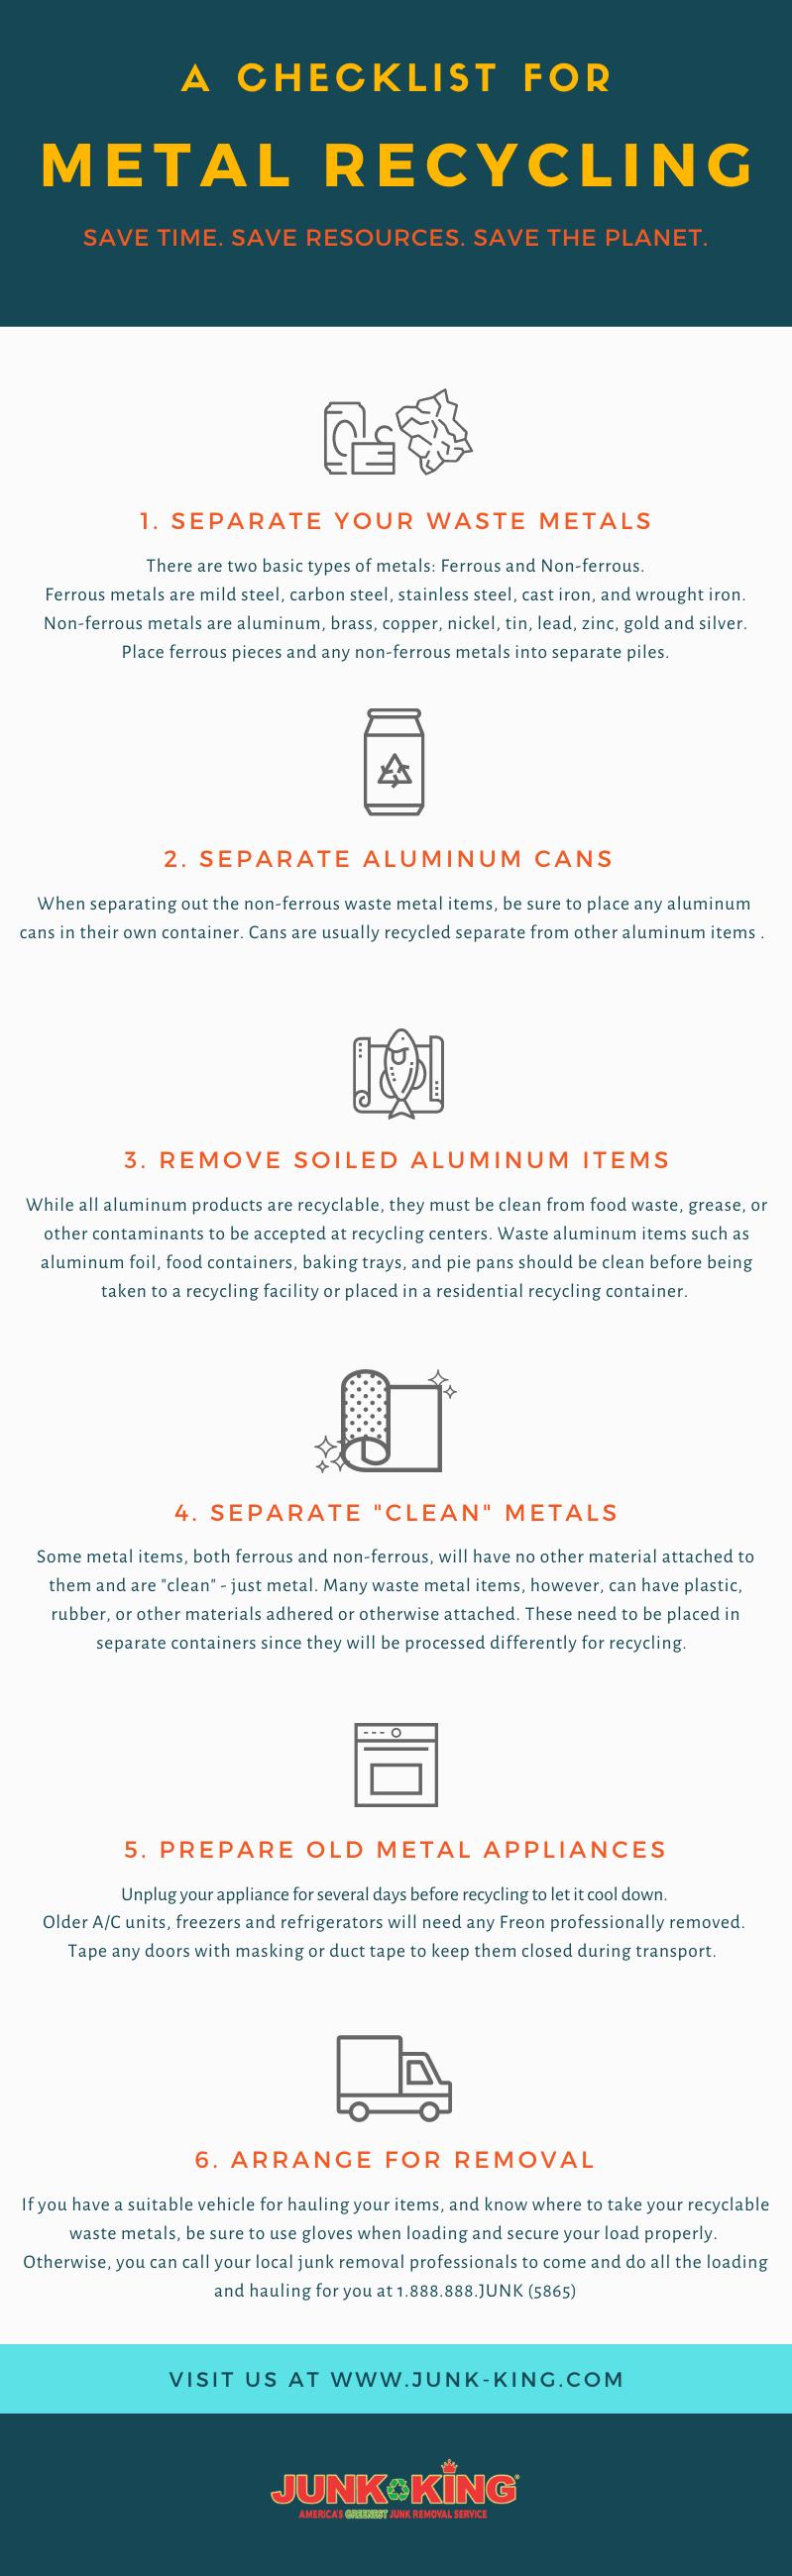 checklist_recycling_metals_png